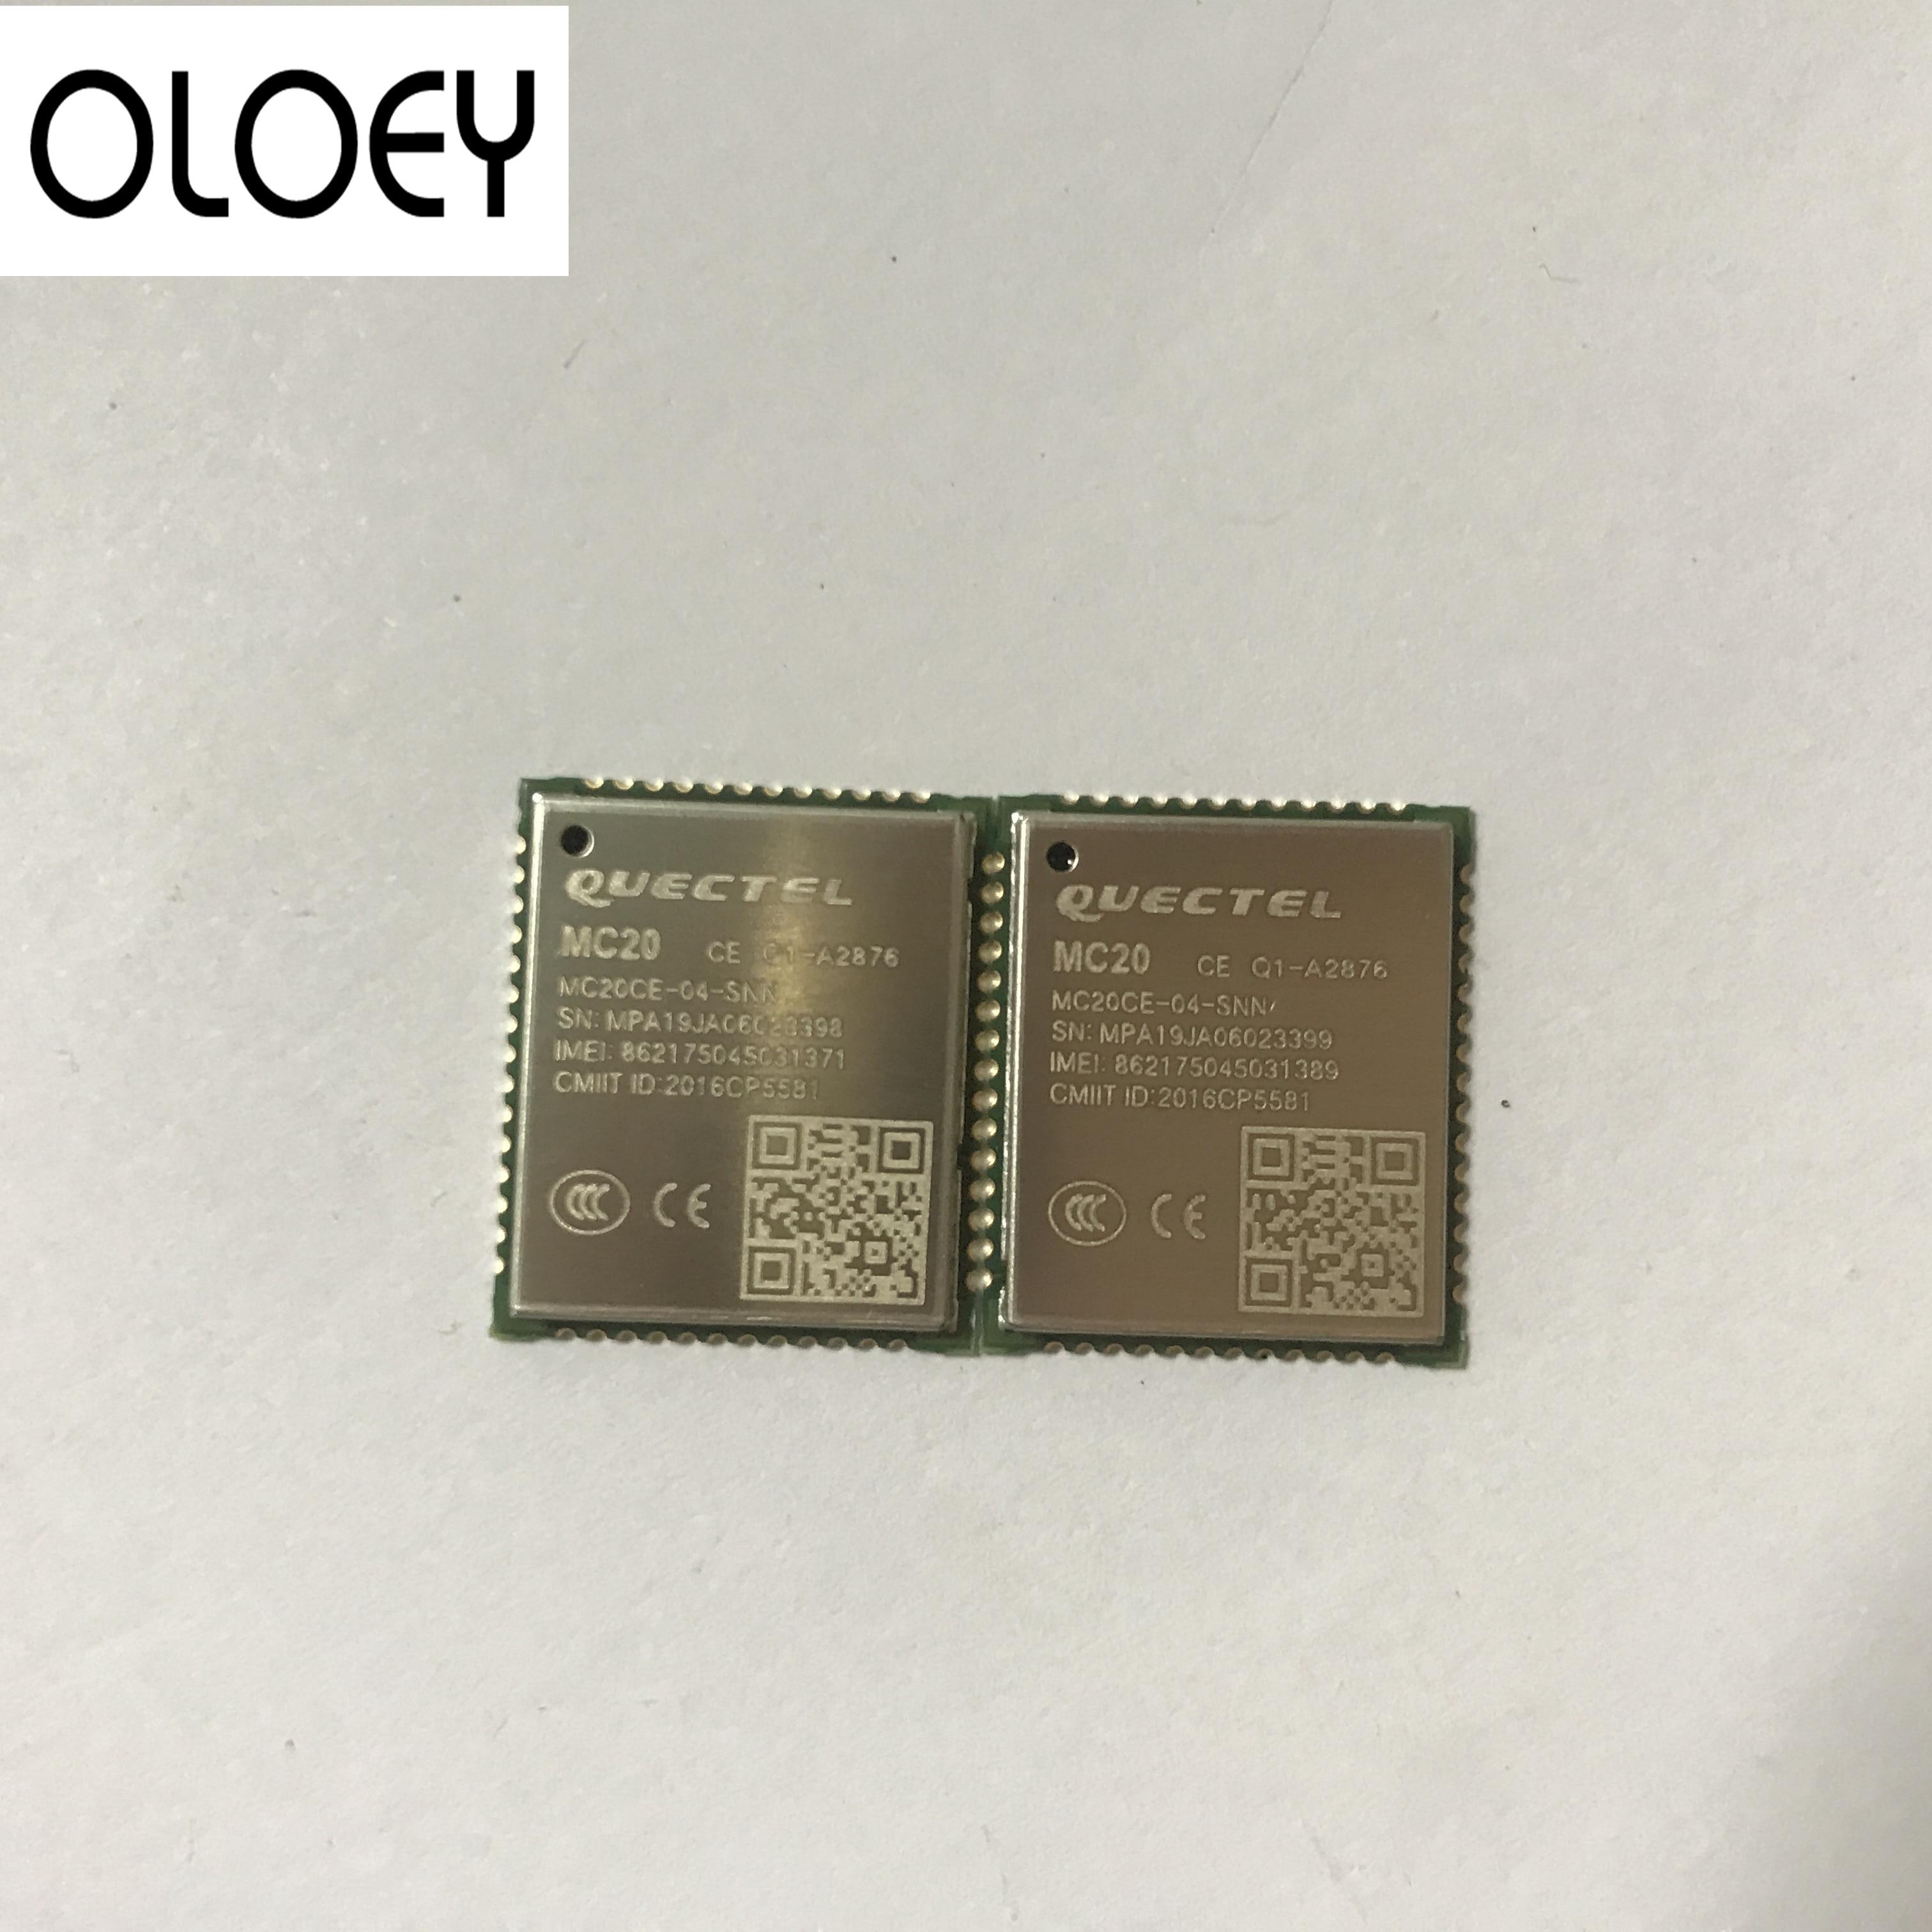 Quectel Module MC20CE-04-SNN LCC  GPRS GPS Module, Brand New Original